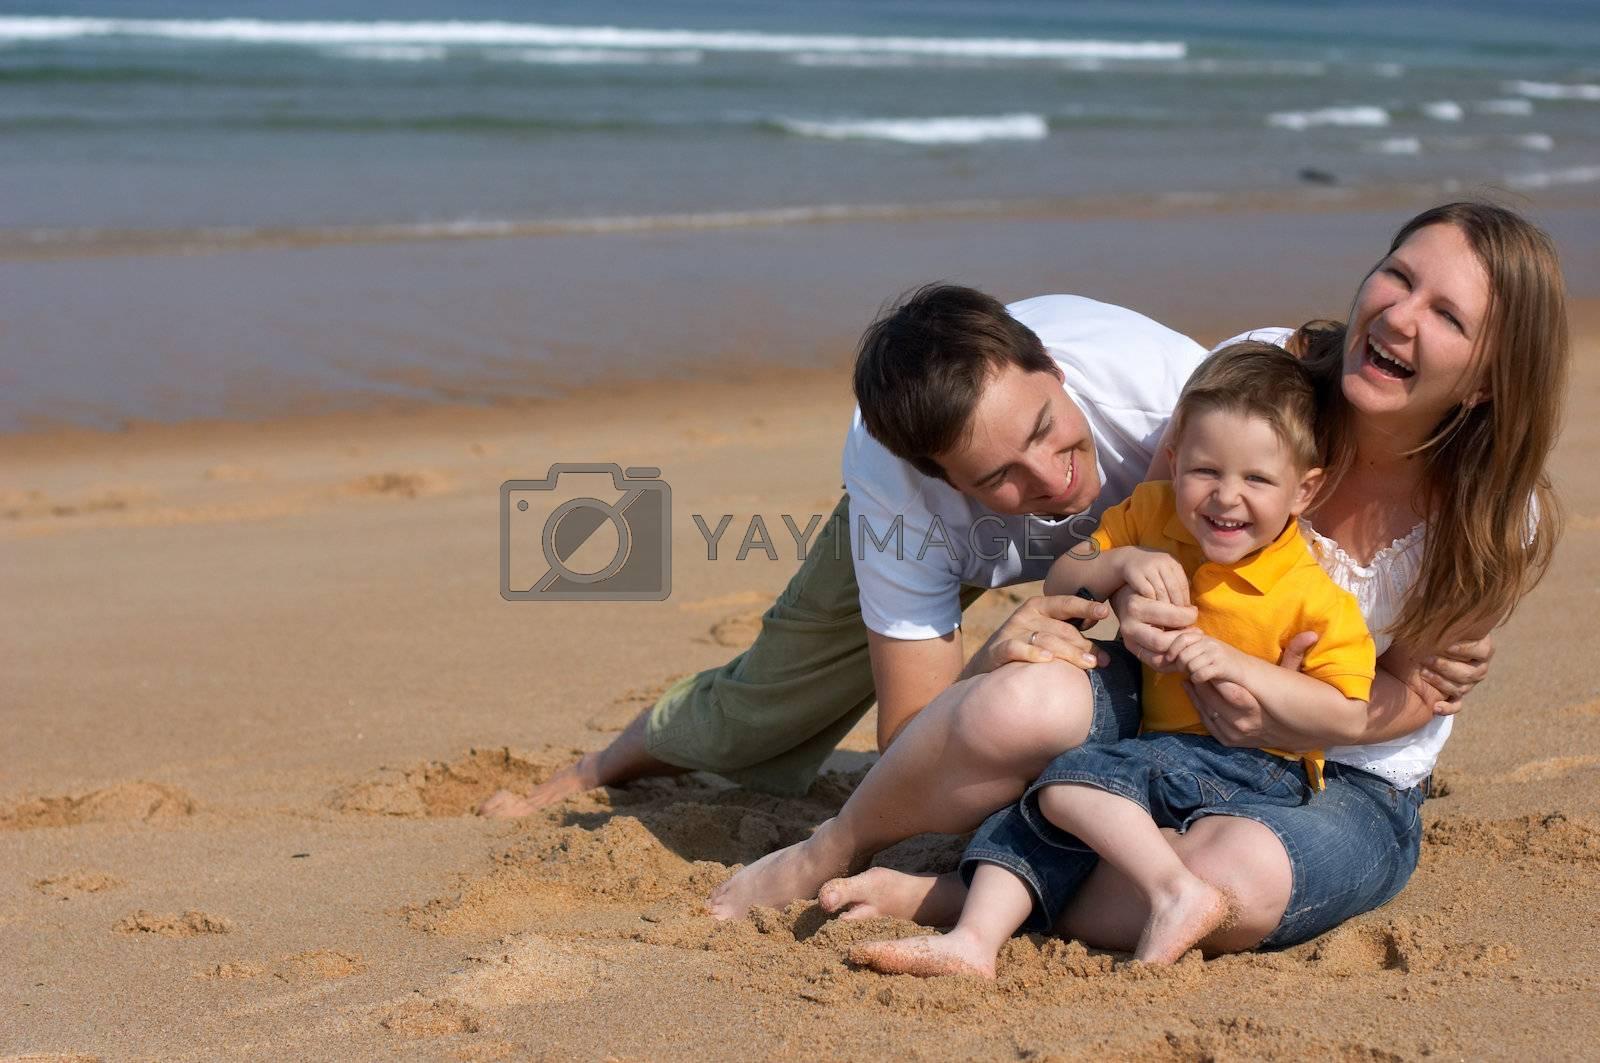 Family fun at the beach by shalamov